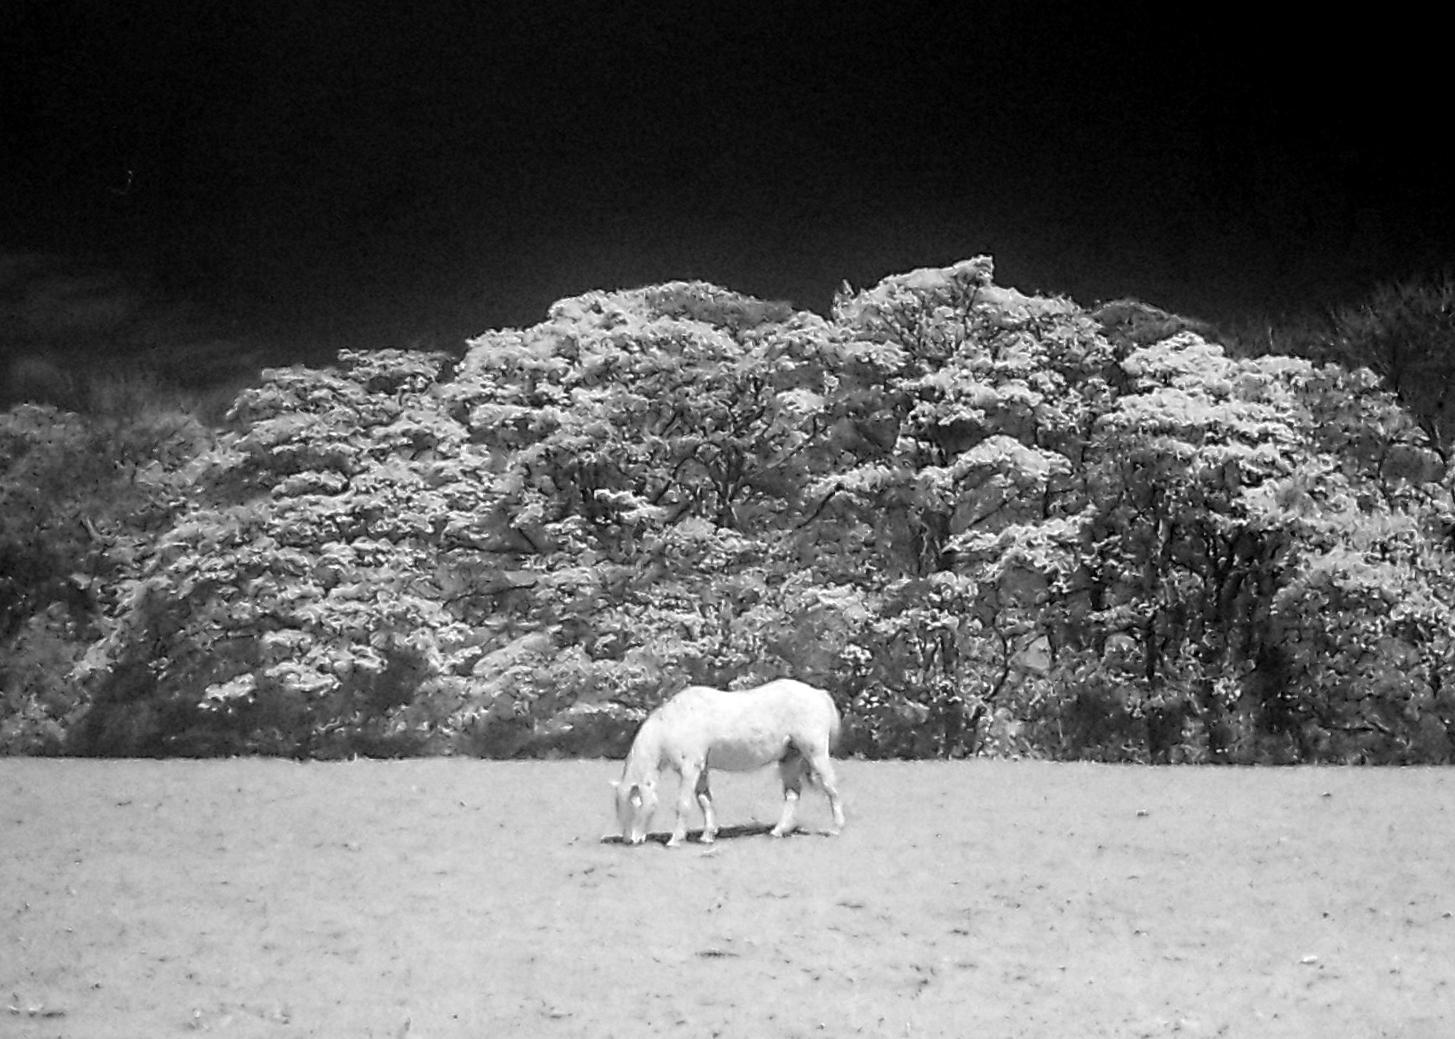 Pale Horse | Zenit TTL | Helios 44mm | Rollie IR 400 | Lucy Wainwright